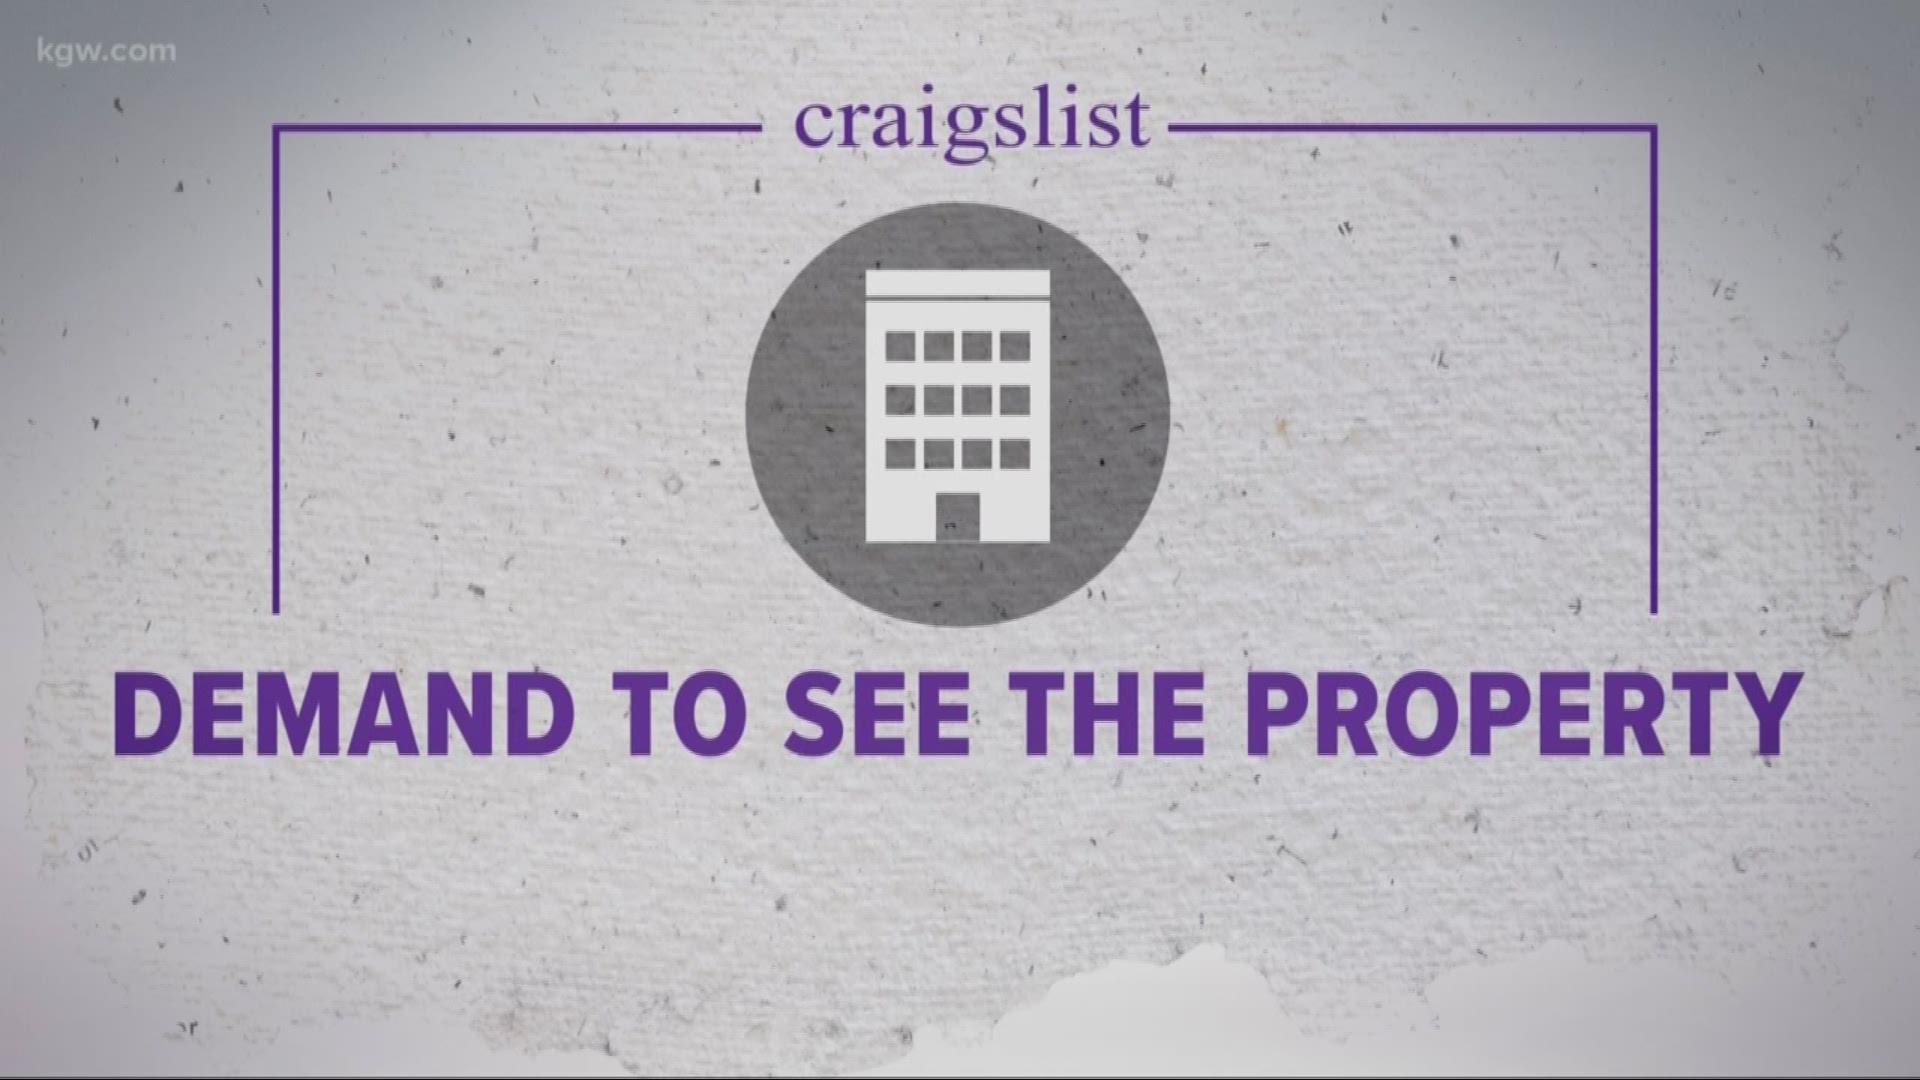 How To Avoid Craigslist Rental Scam Kiiitv Com